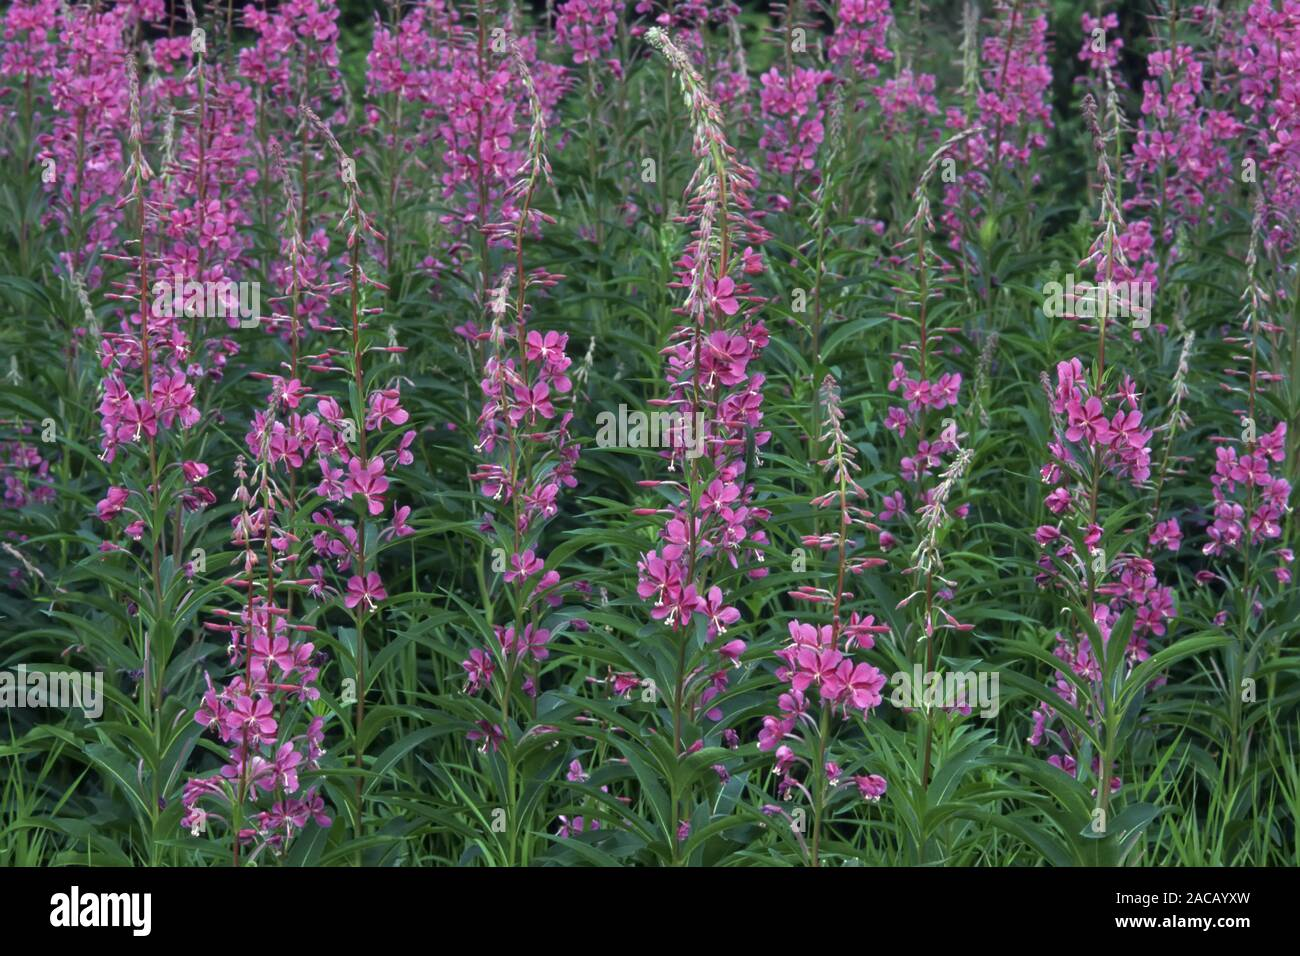 Perennial fireweed (Epilobium angustifolium) Stock Photo